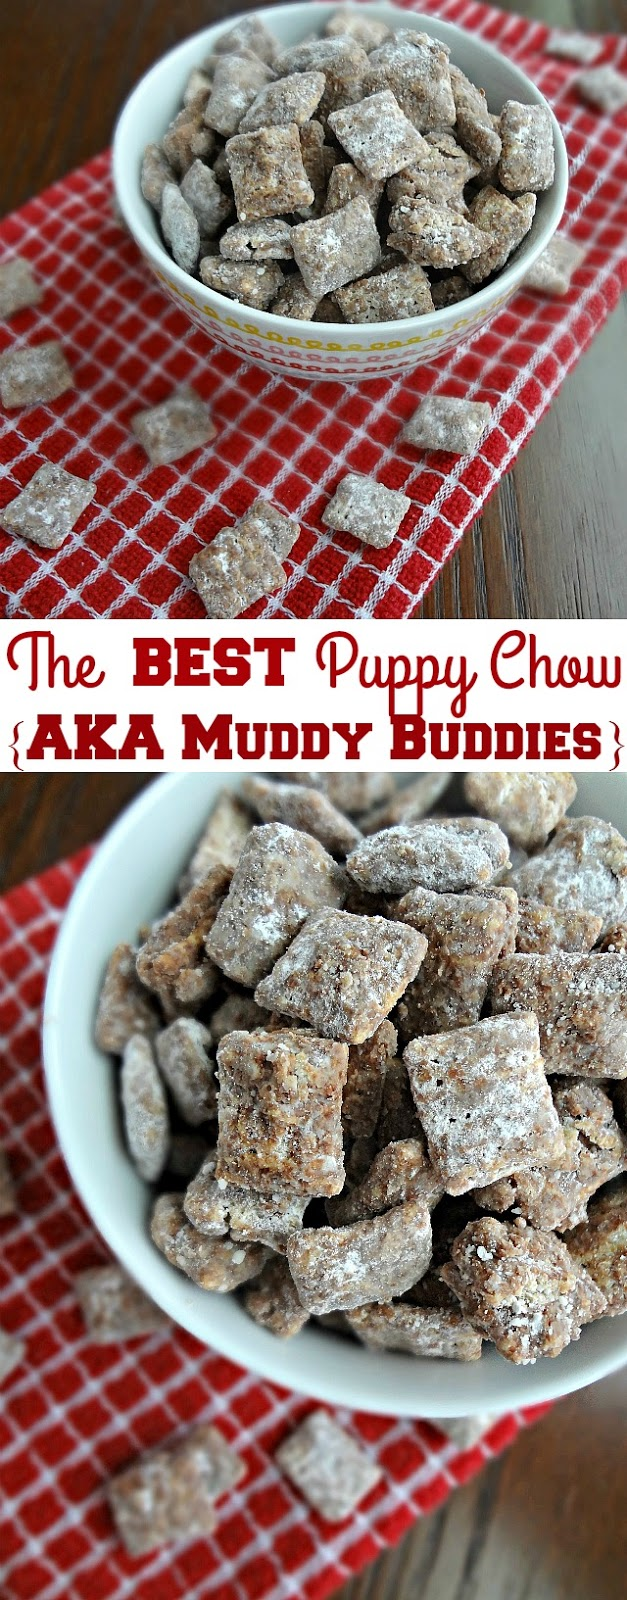 The BEST Puppy Chow (AKA Muddy Buddies)